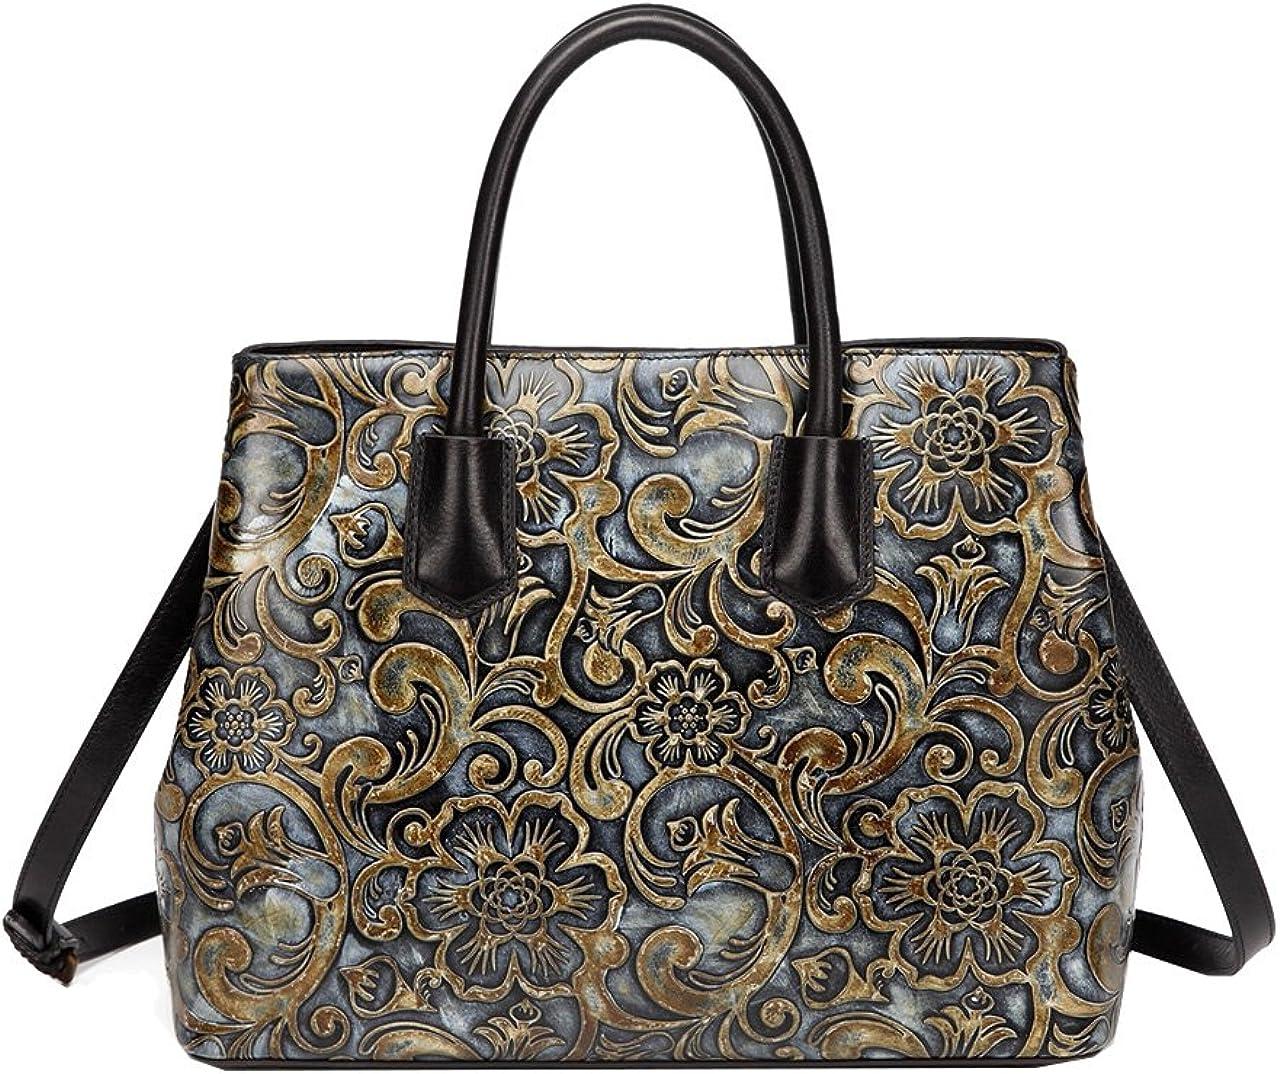 Jair Retro Floral Embossed Genuine Leather Crossbody Tote Bags Handbags for Women